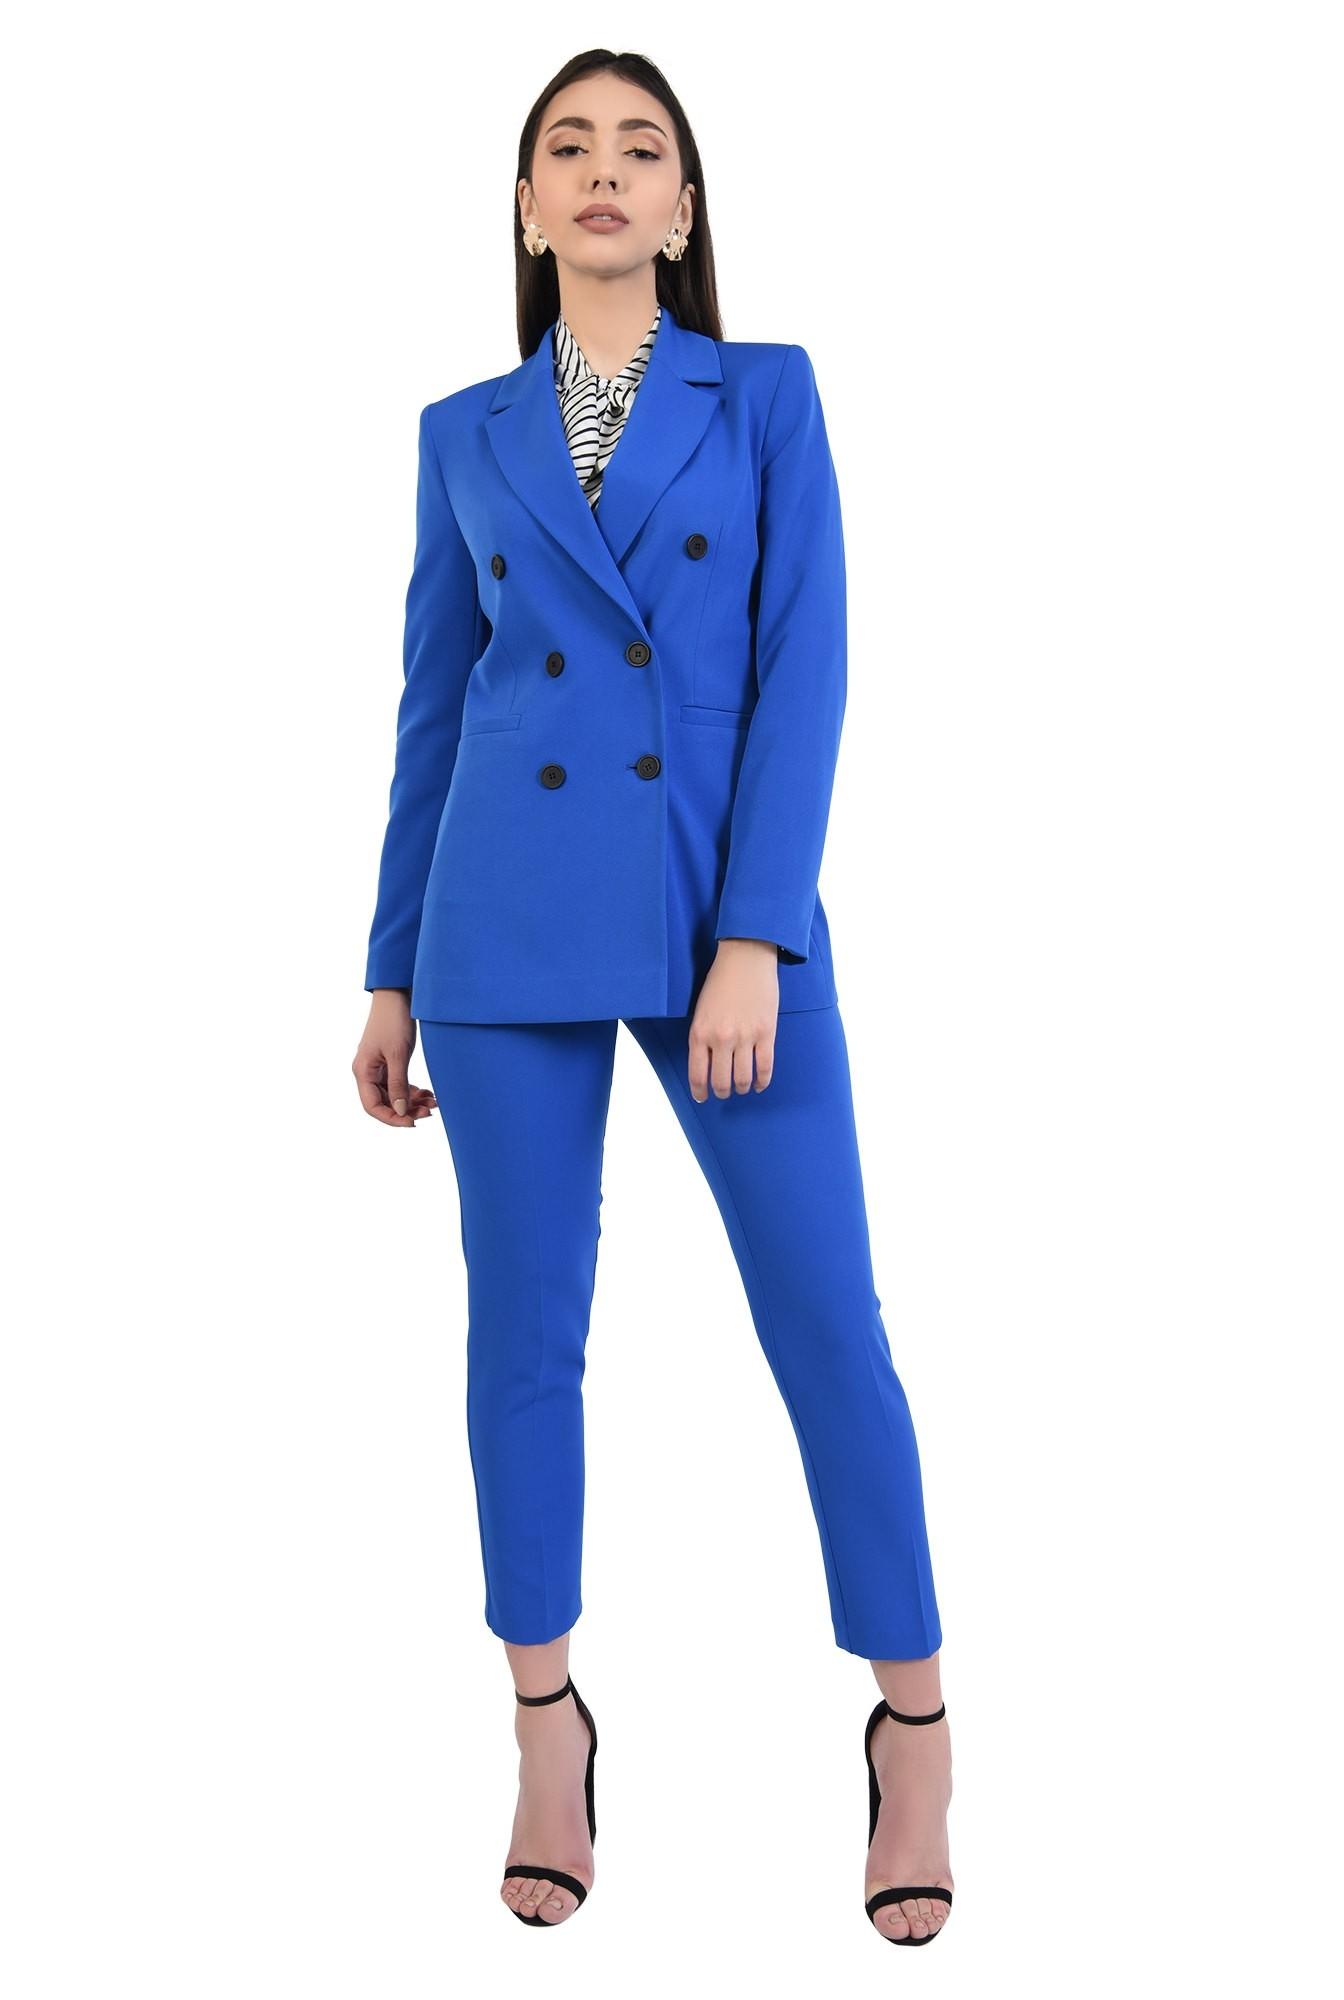 pantaloni conici, albastri, lungi, croi tigareta, talie medie